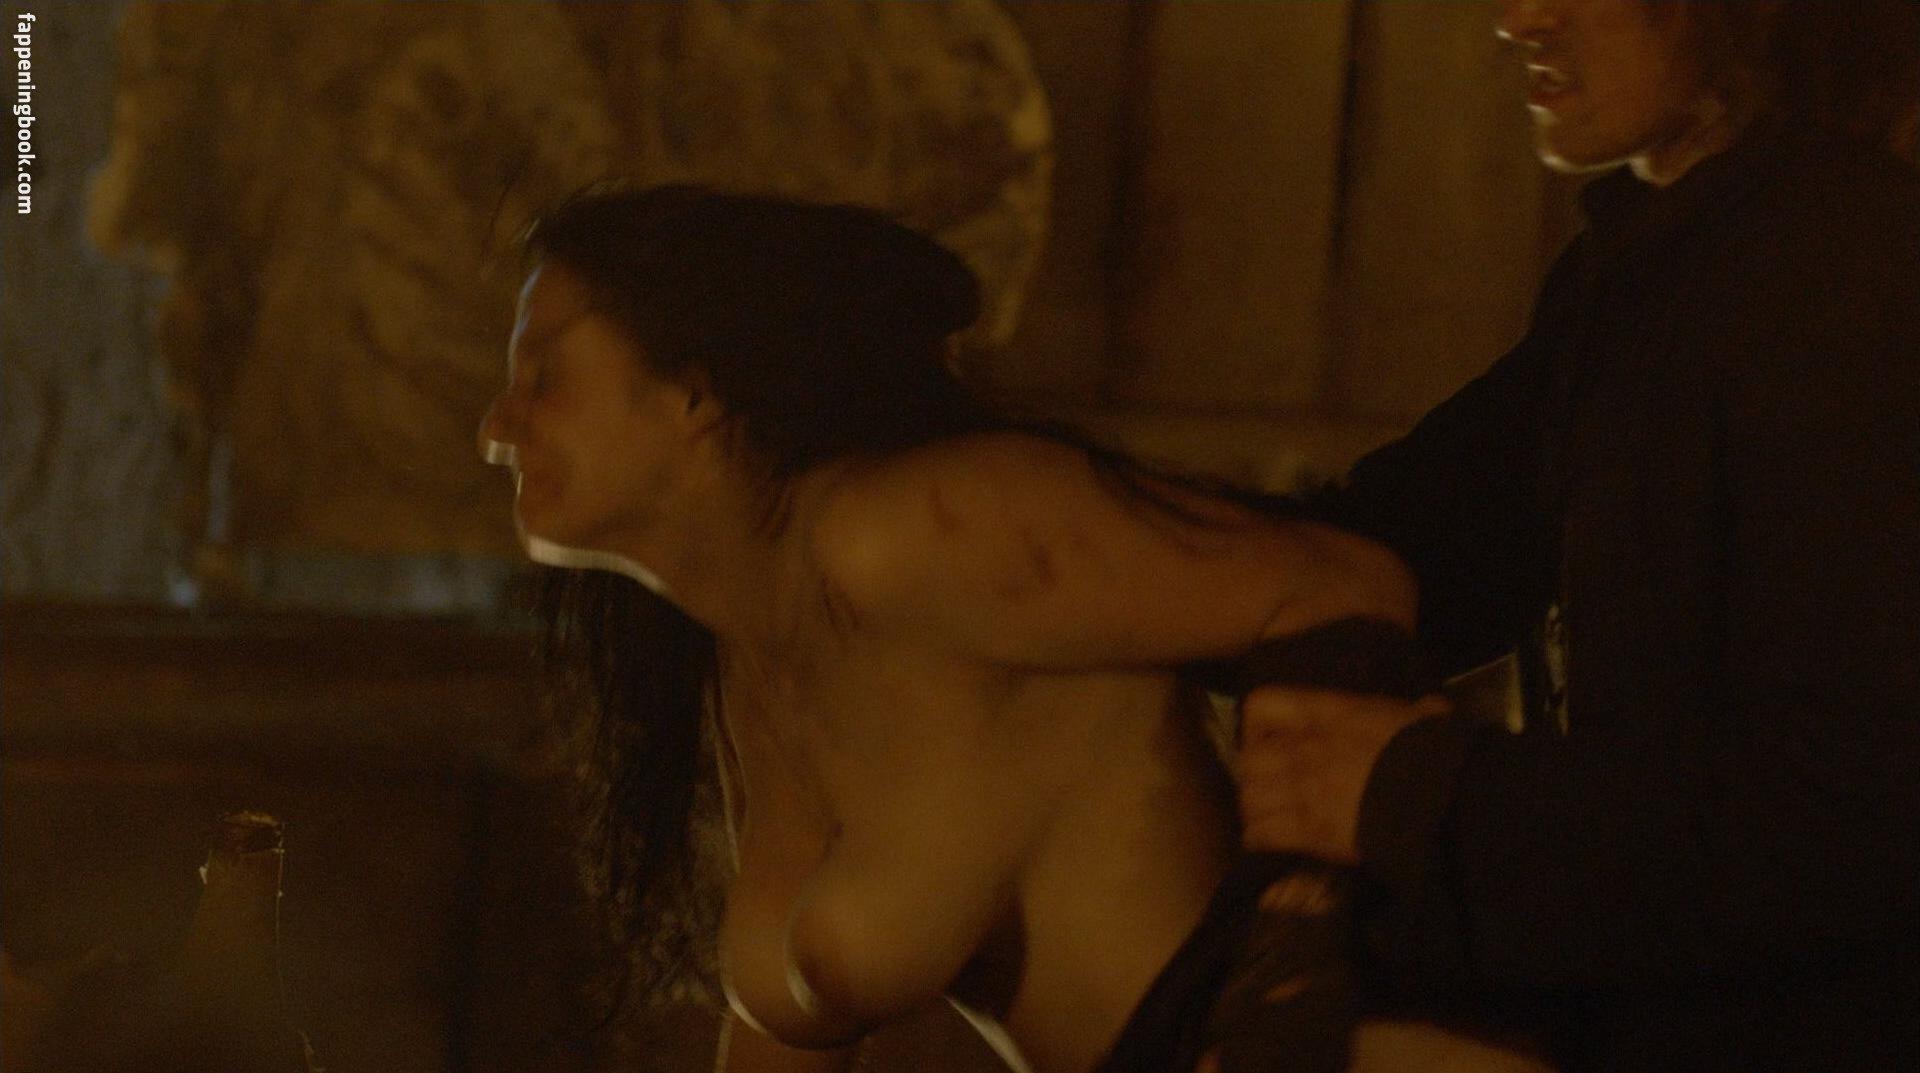 Aeryn Walker Porno aeryn walker nude, sexy, the fappening, uncensored - photo